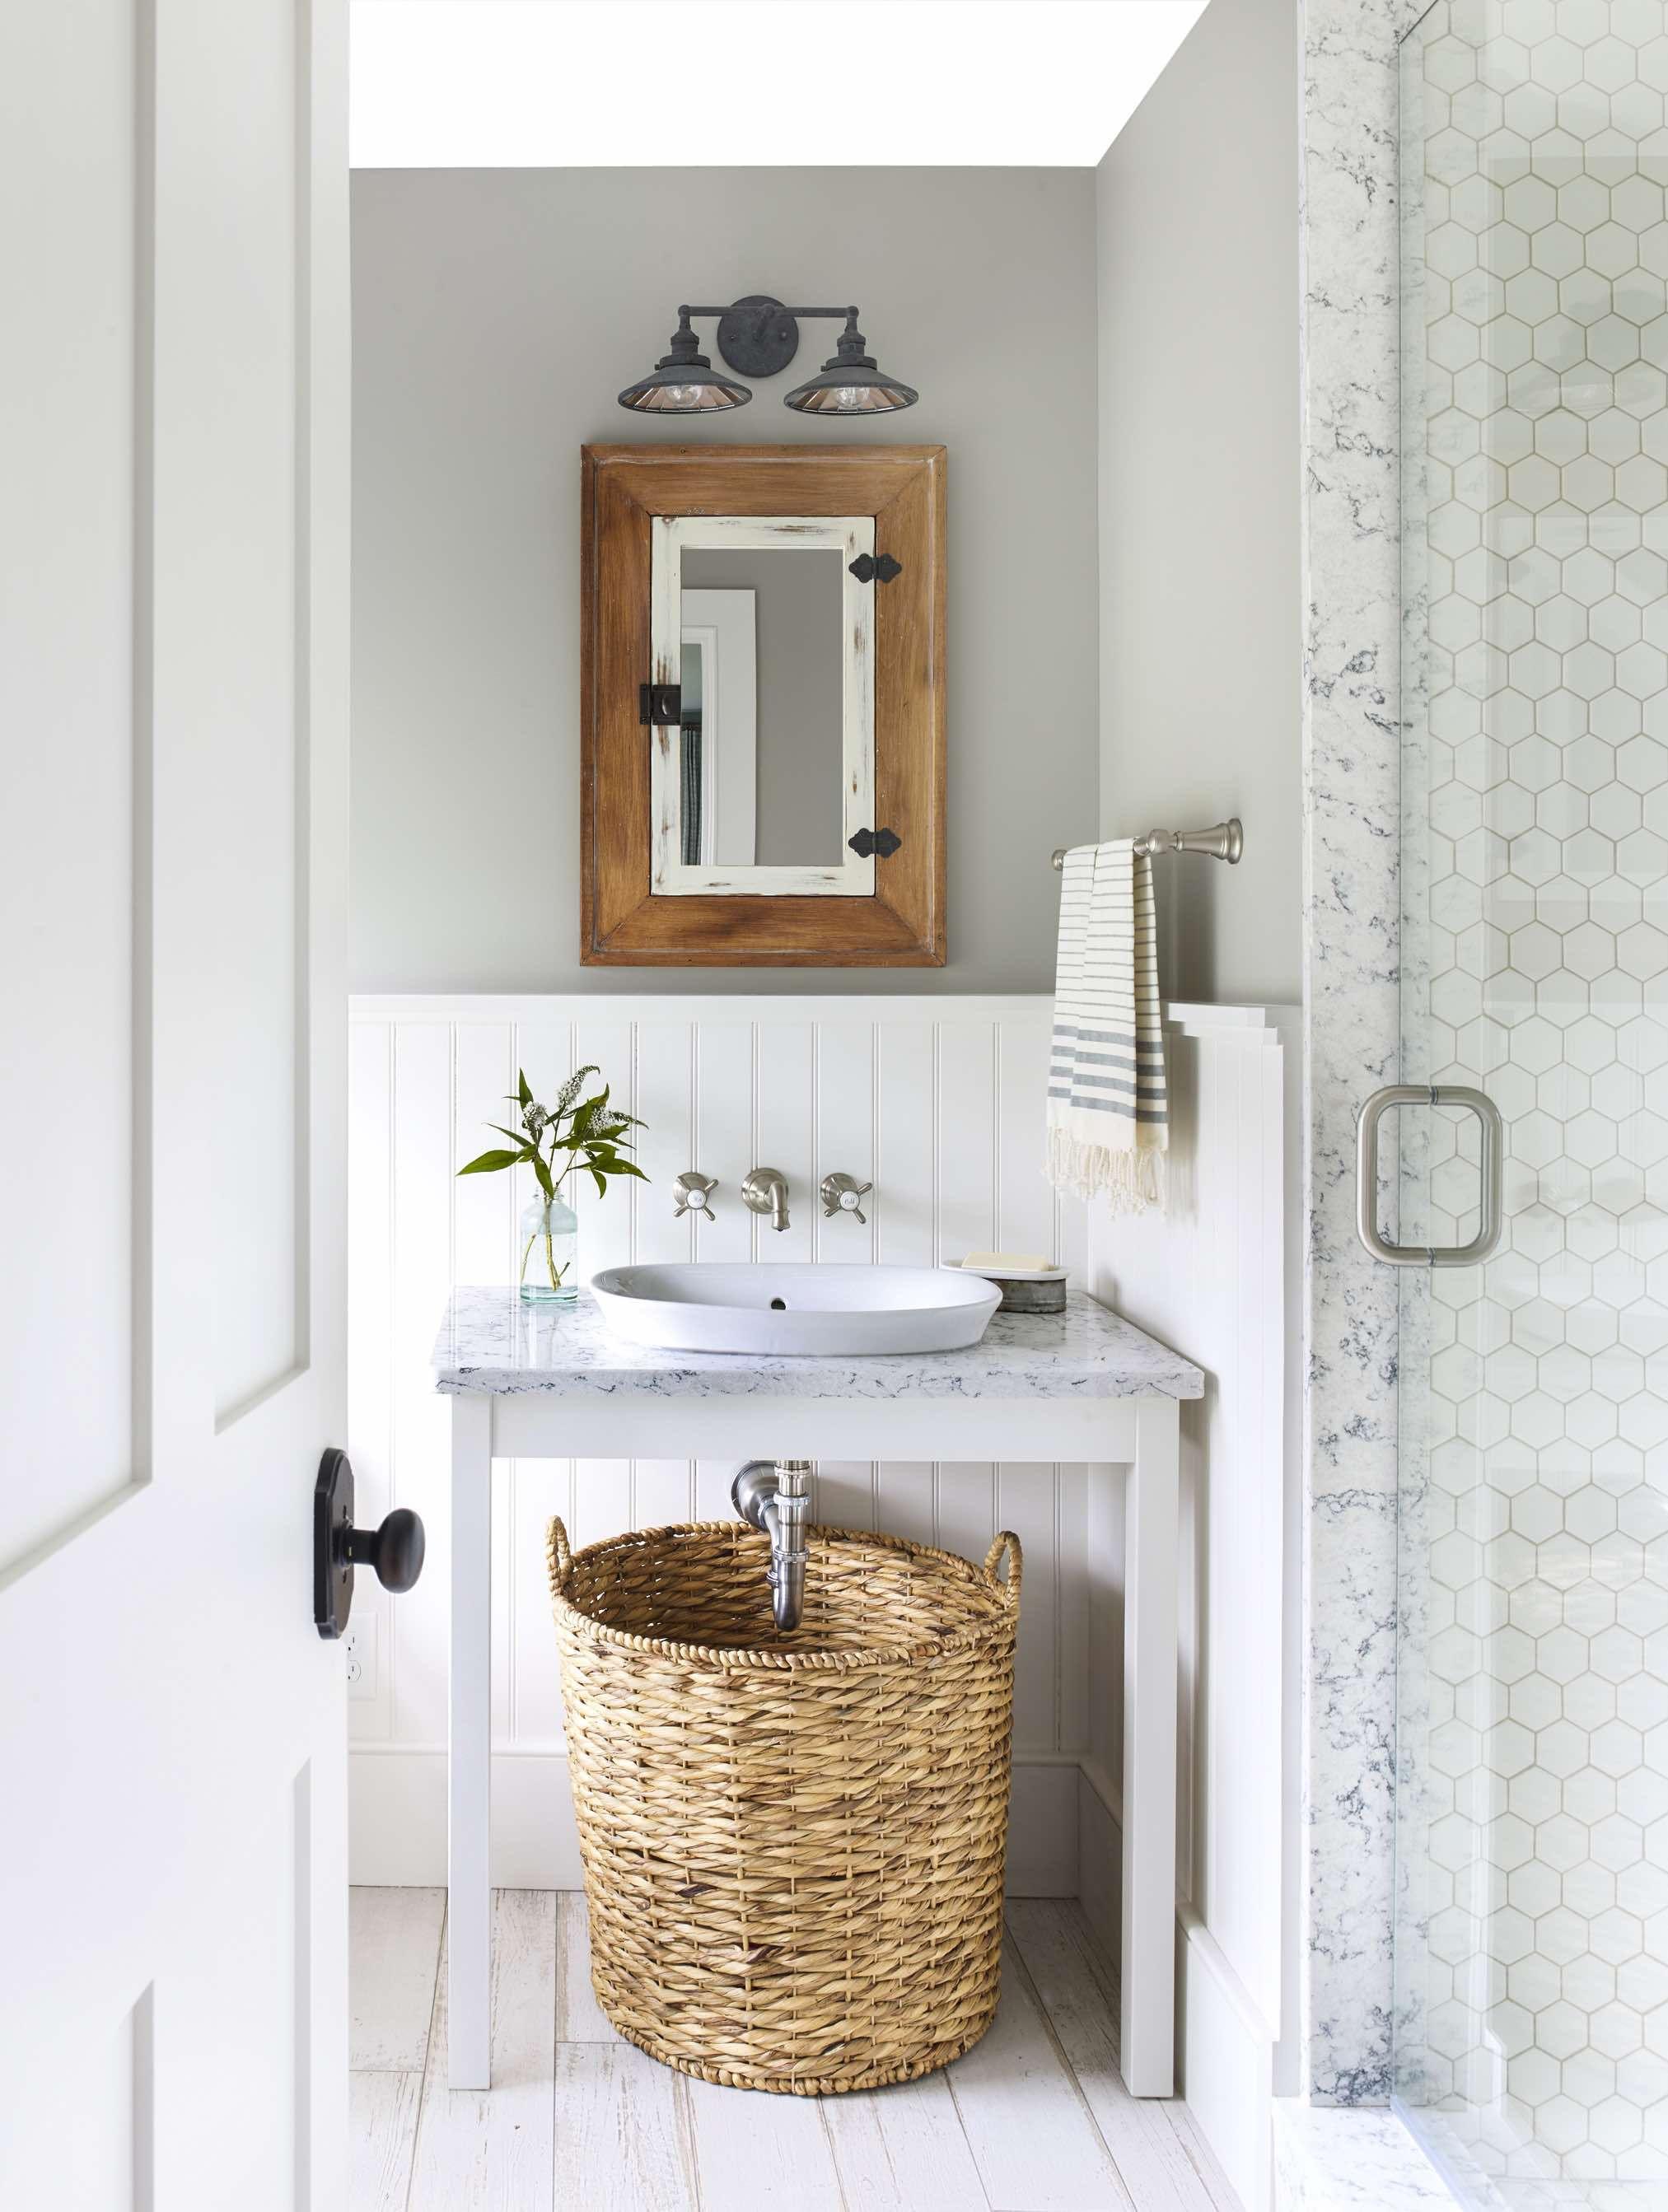 20 Best Bathroom Paint Colors - Popular Ideas for Bathroom Wall Colors